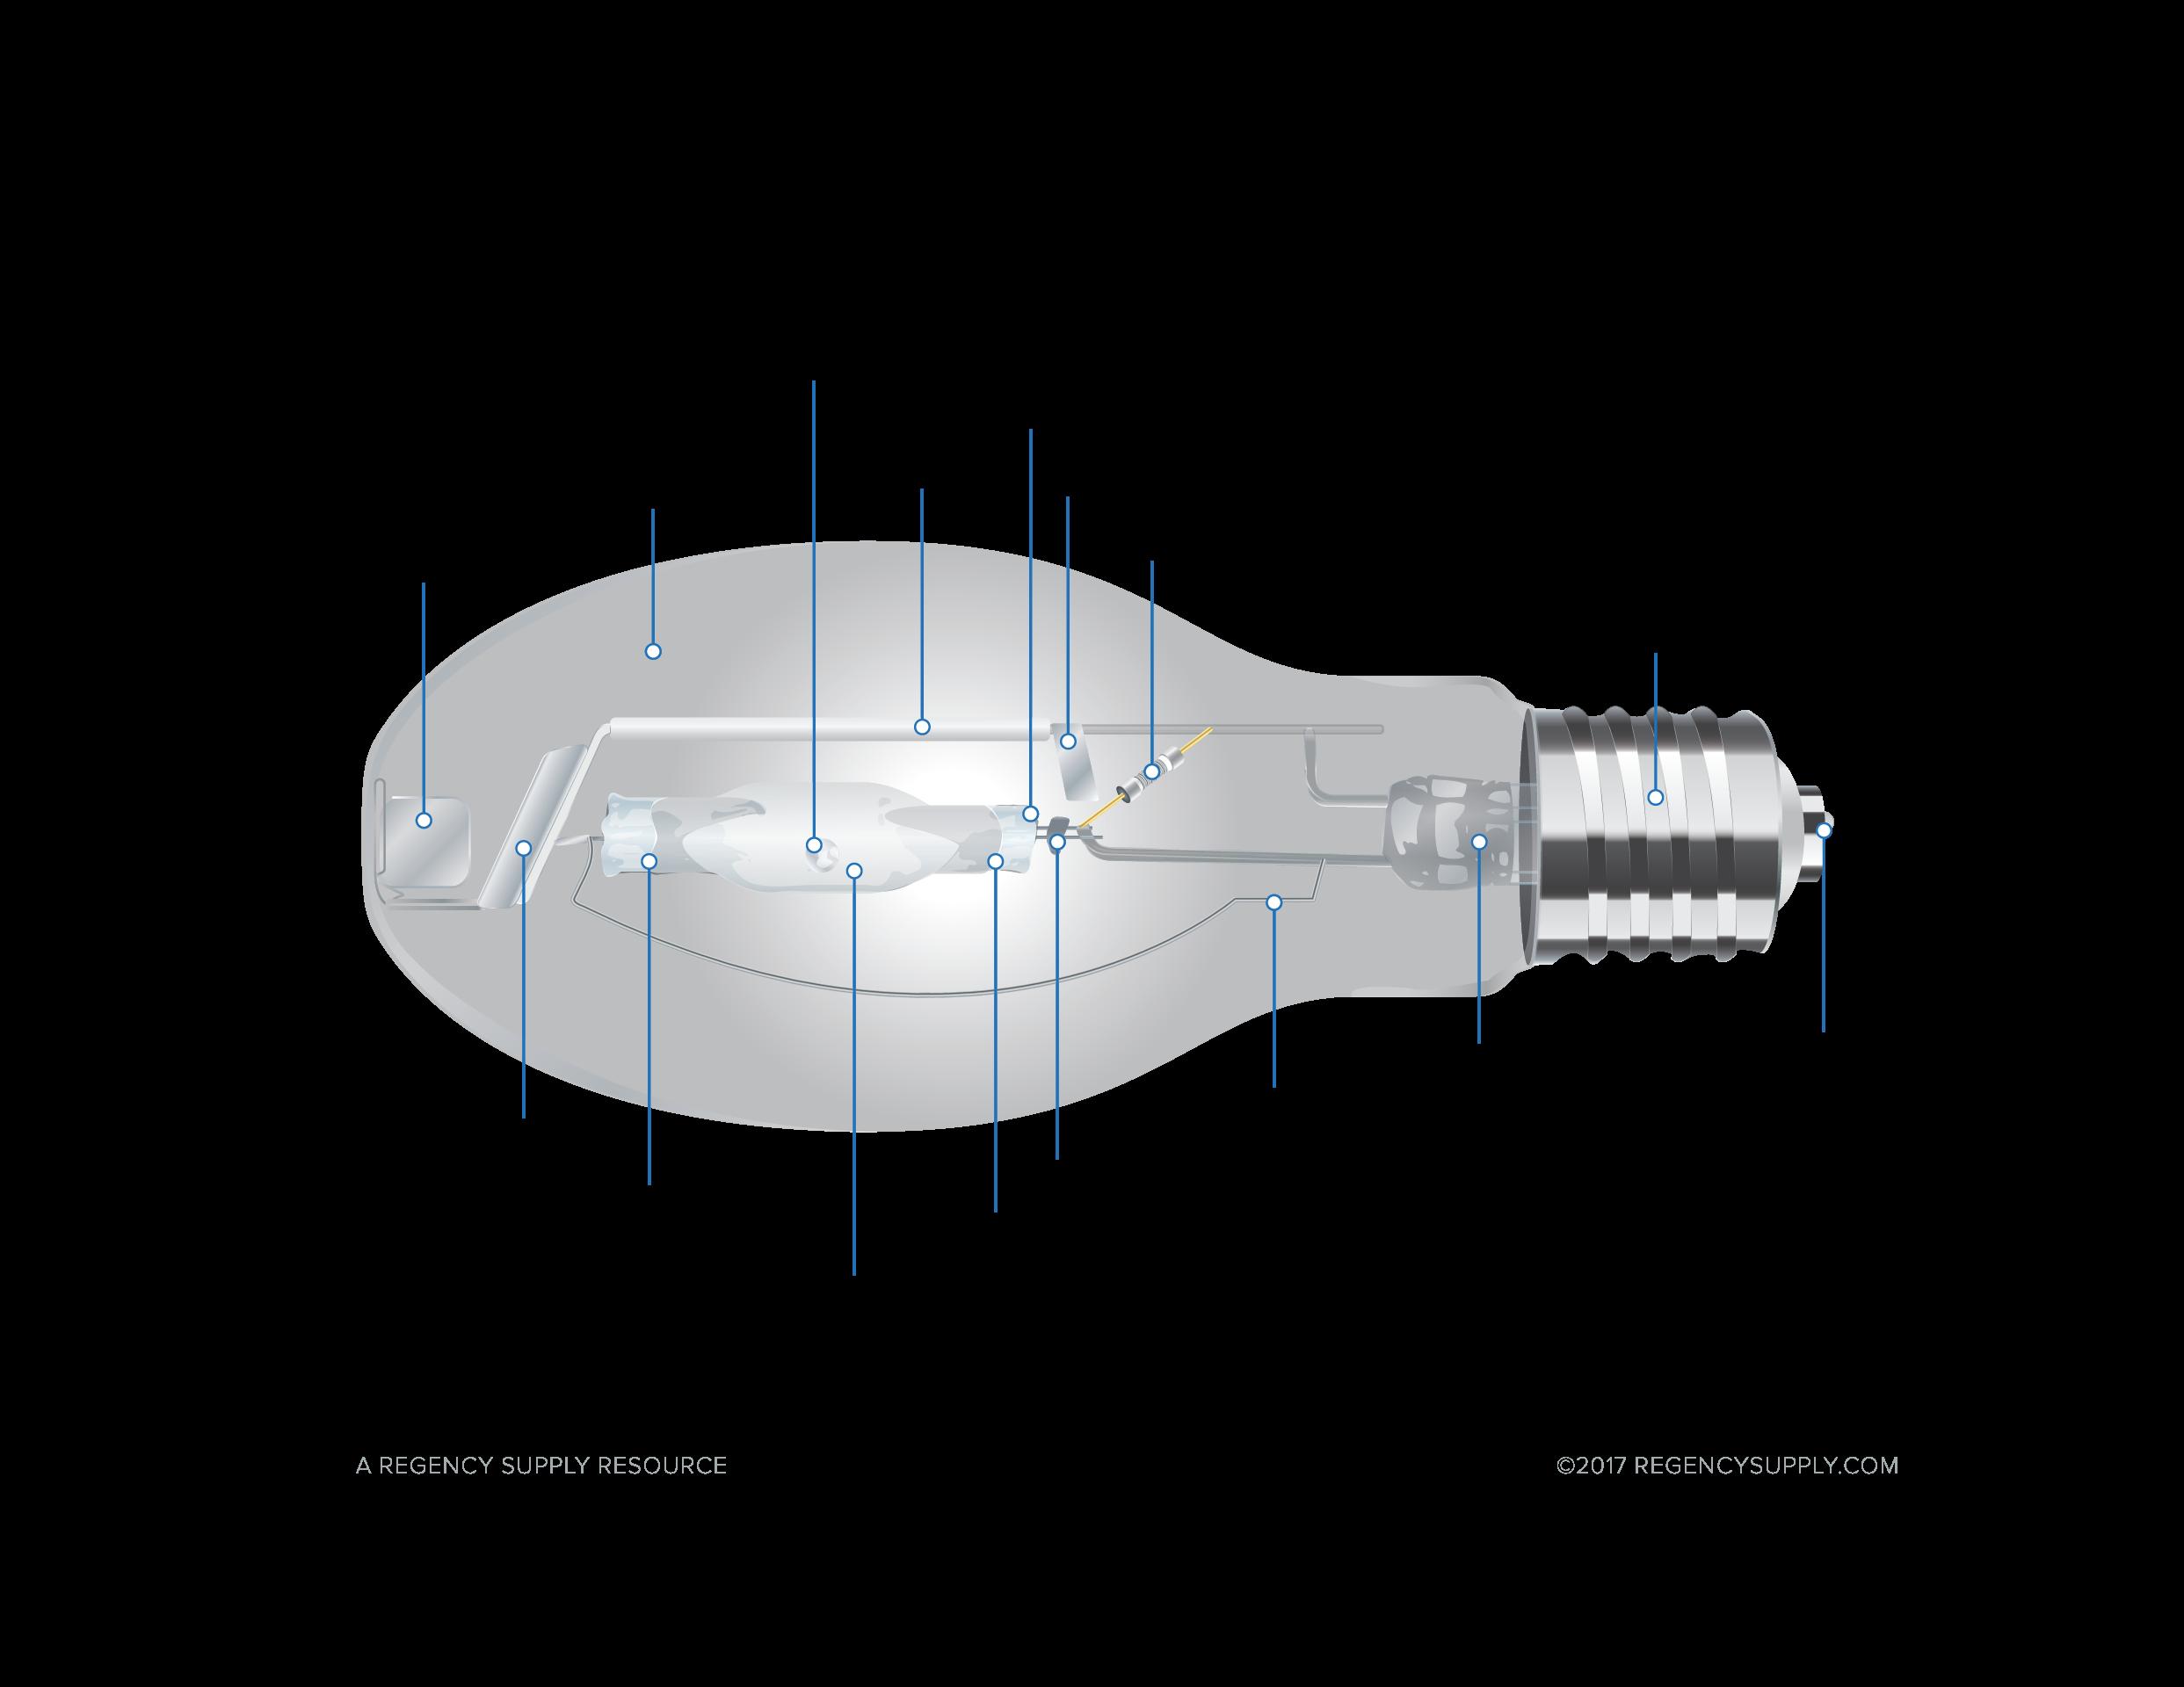 Watch additionally Hid Lighting Kit Wiring Diagram in addition Gmc Morimoto Xb Led in addition Chevrolet Headlight Harness Forum Hid additionally 9006 3A Morimoto Elite HID System. on 2014 silverado morimoto elite